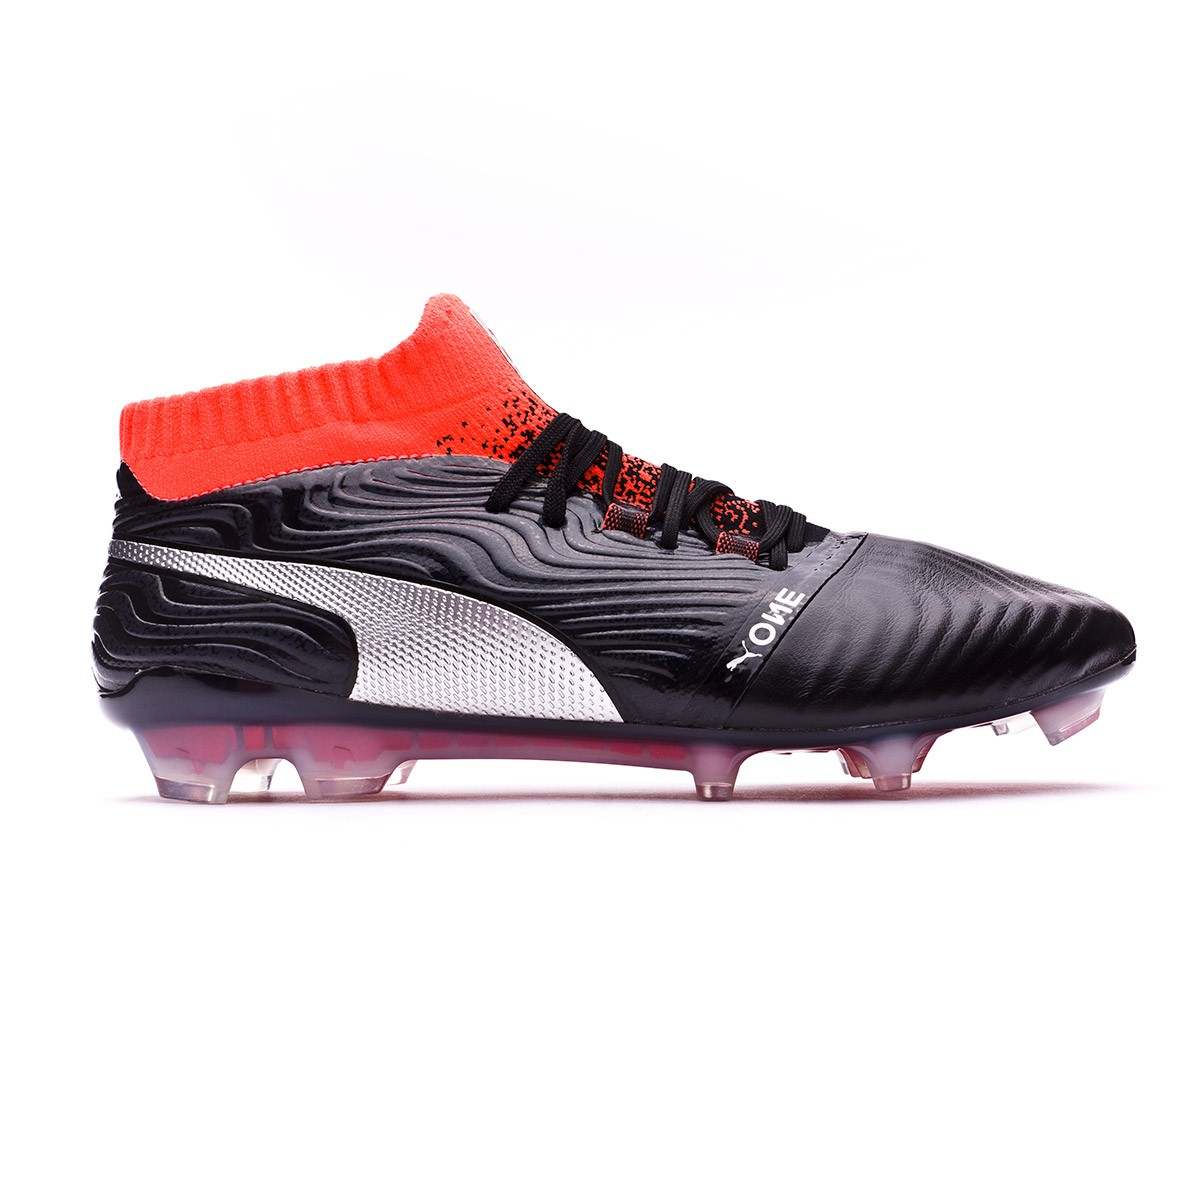 Boot Puma One 18.1 FG Puma Black-Puma Silver-Red Blast - Football ... d02e6df8568